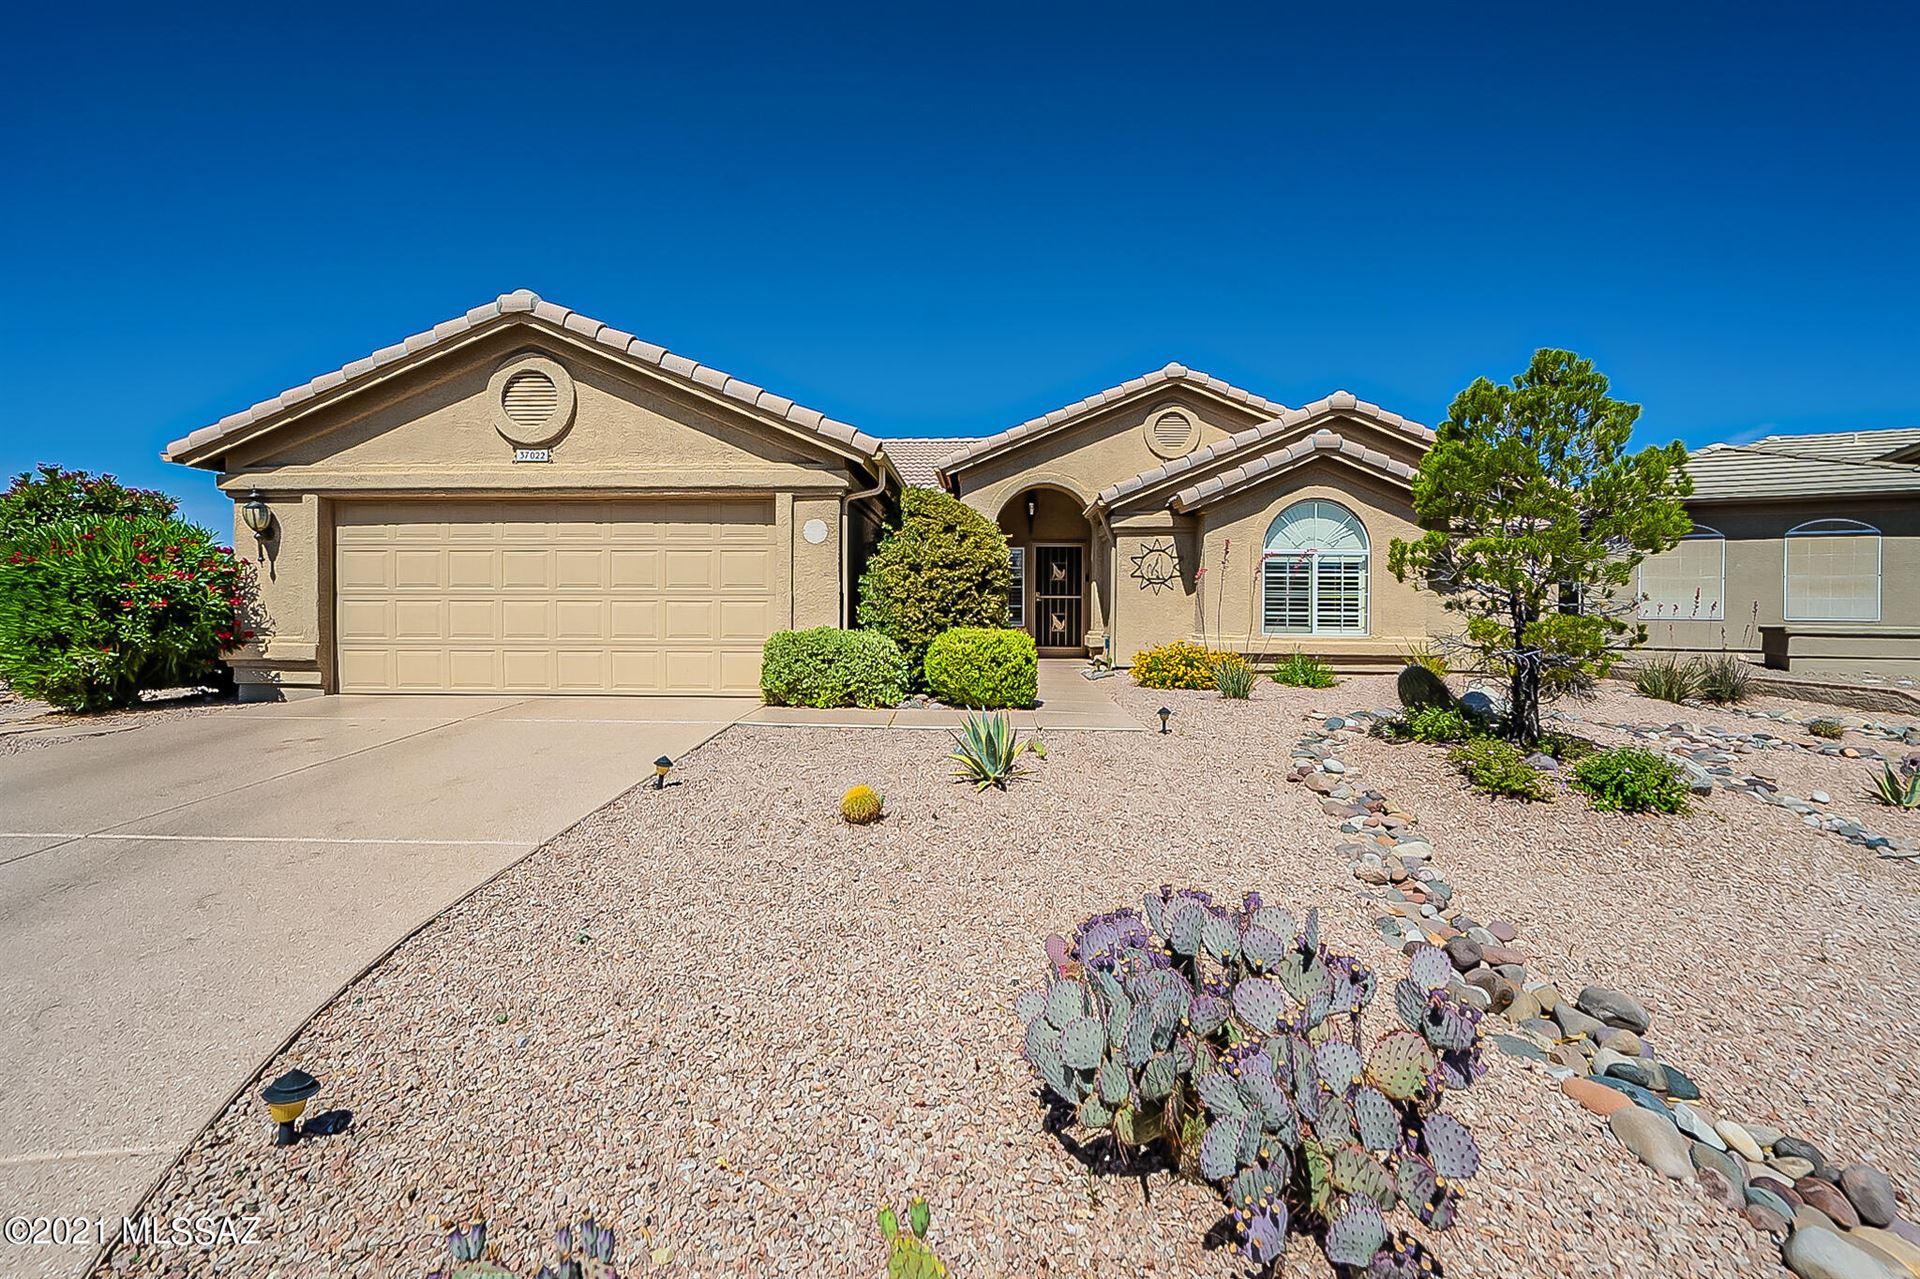 37022 S Ridgeview Court, Saddlebrooke, AZ 85739 - MLS#: 22113540